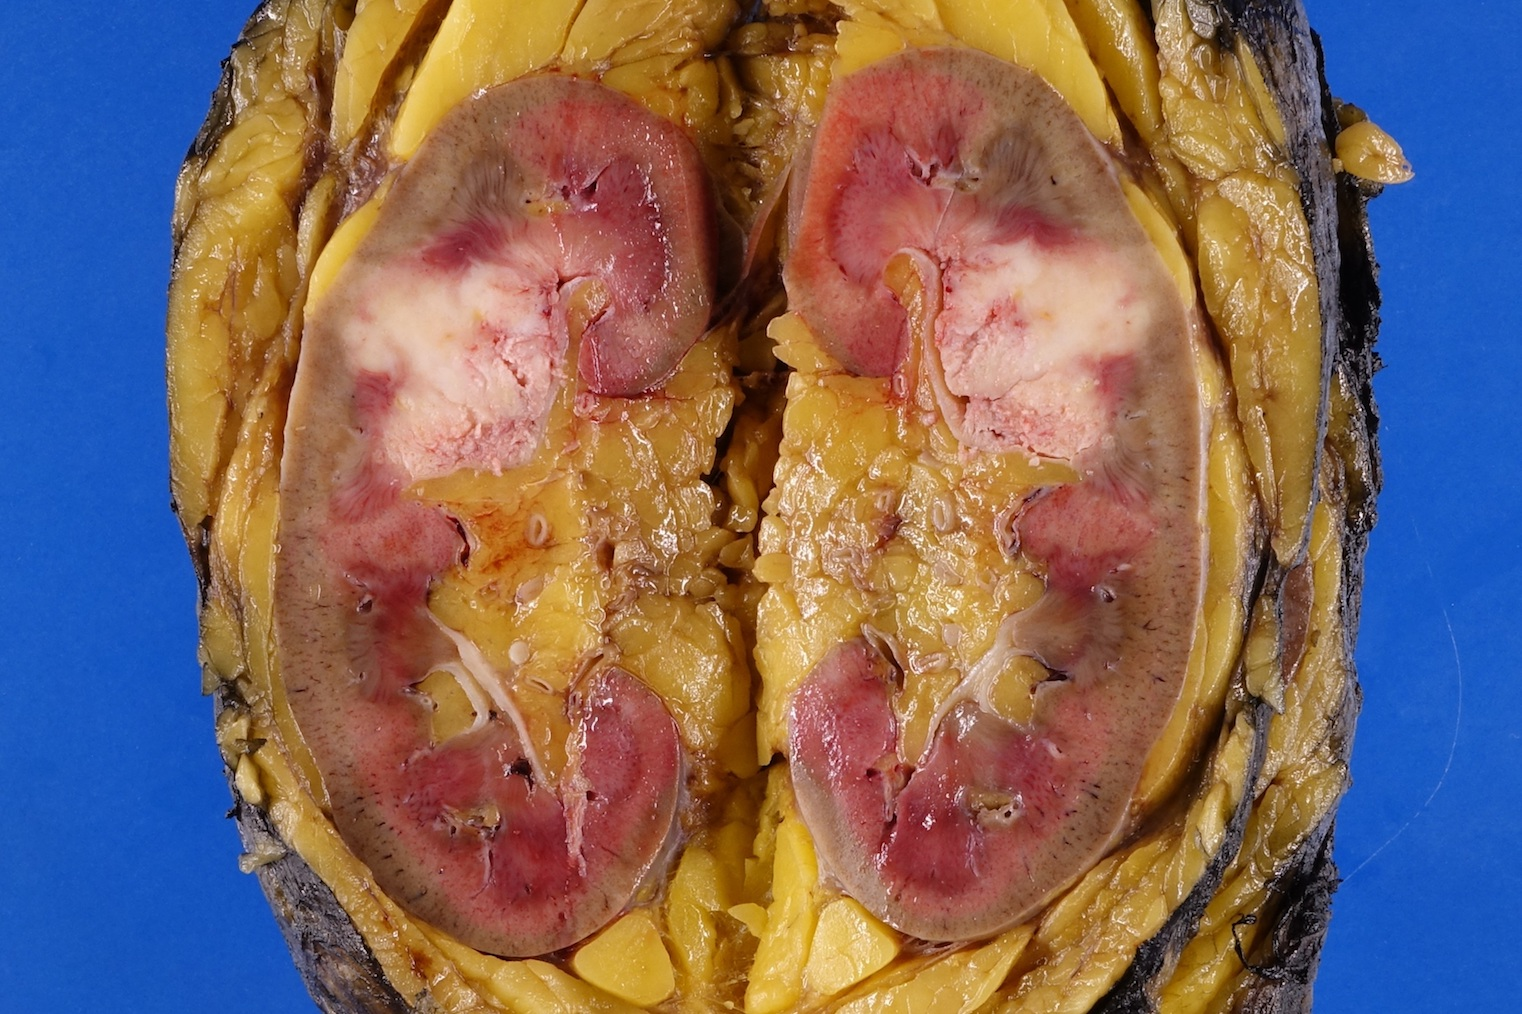 Renal pelvic and peripelvic fat invasion (pT3)